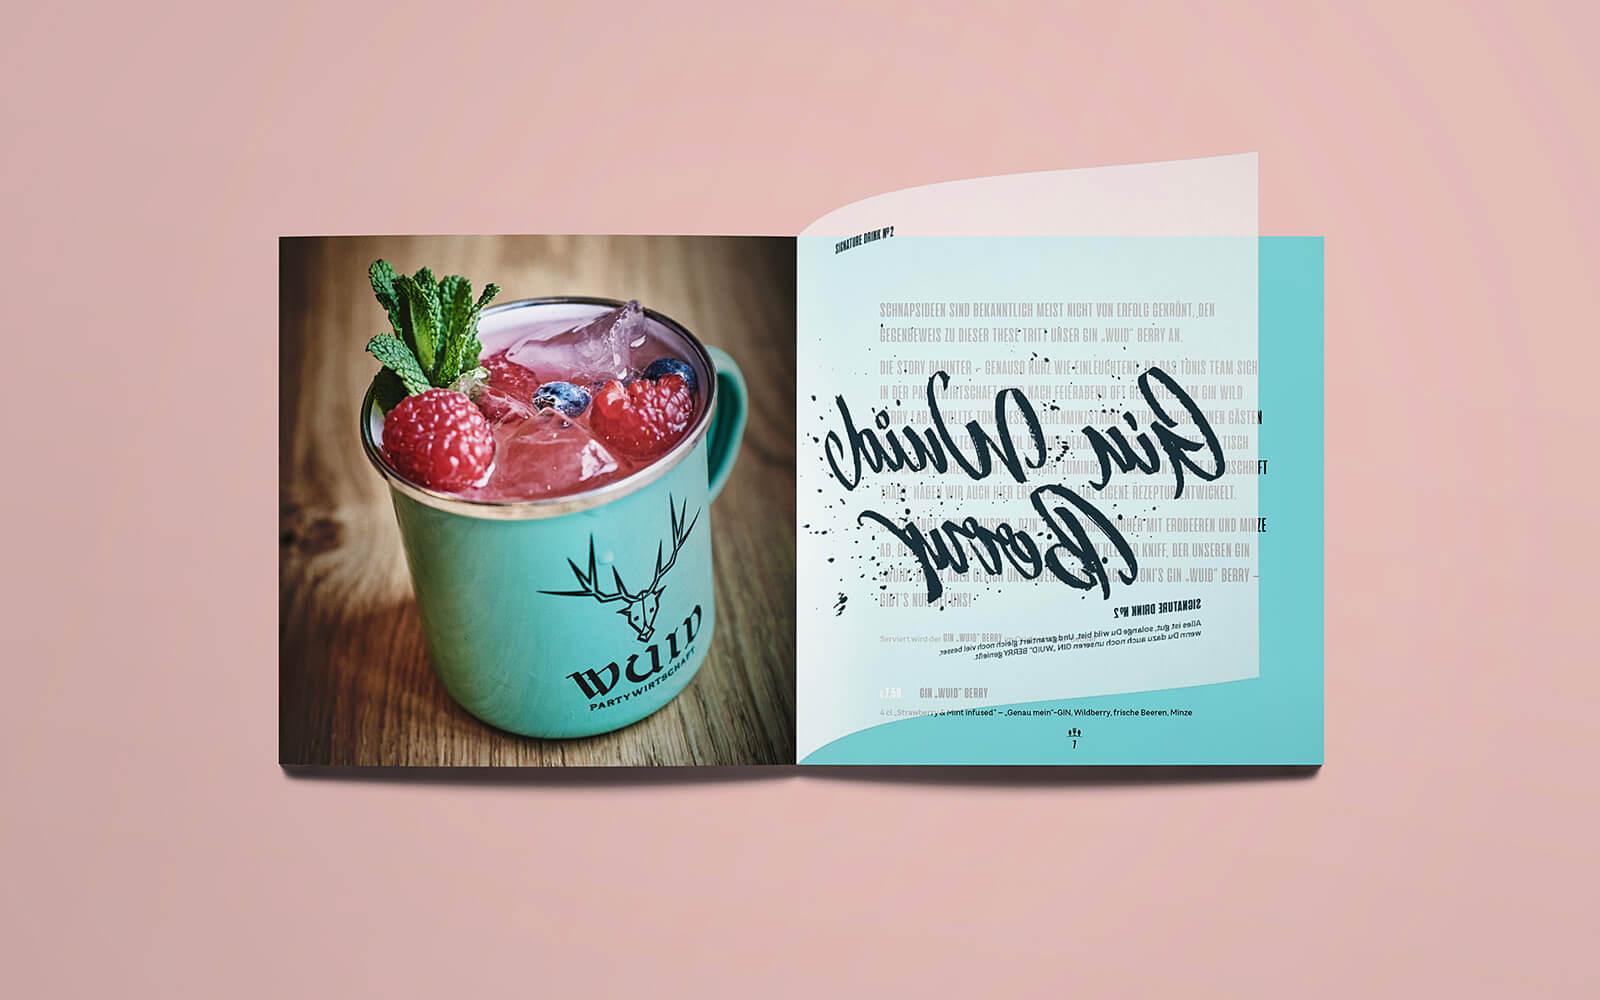 TONI's Getränkekarte – Gin WUID Berry